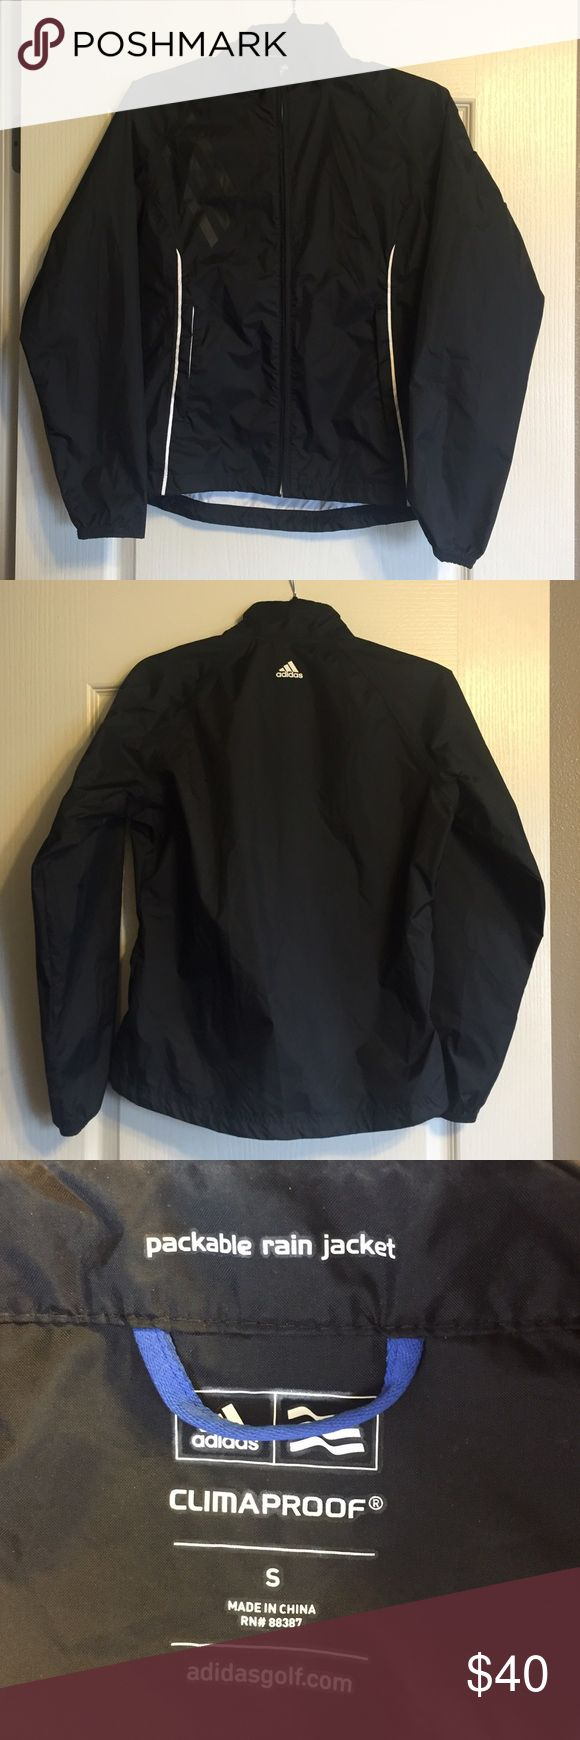 Adidas Ladies ClimaProof Golf Rain Jacket Adidas Ladies ClimaProof Golf Rain Jacket in excellent condition, worn a couple times. Adidas Jackets & Coats Utility Jackets